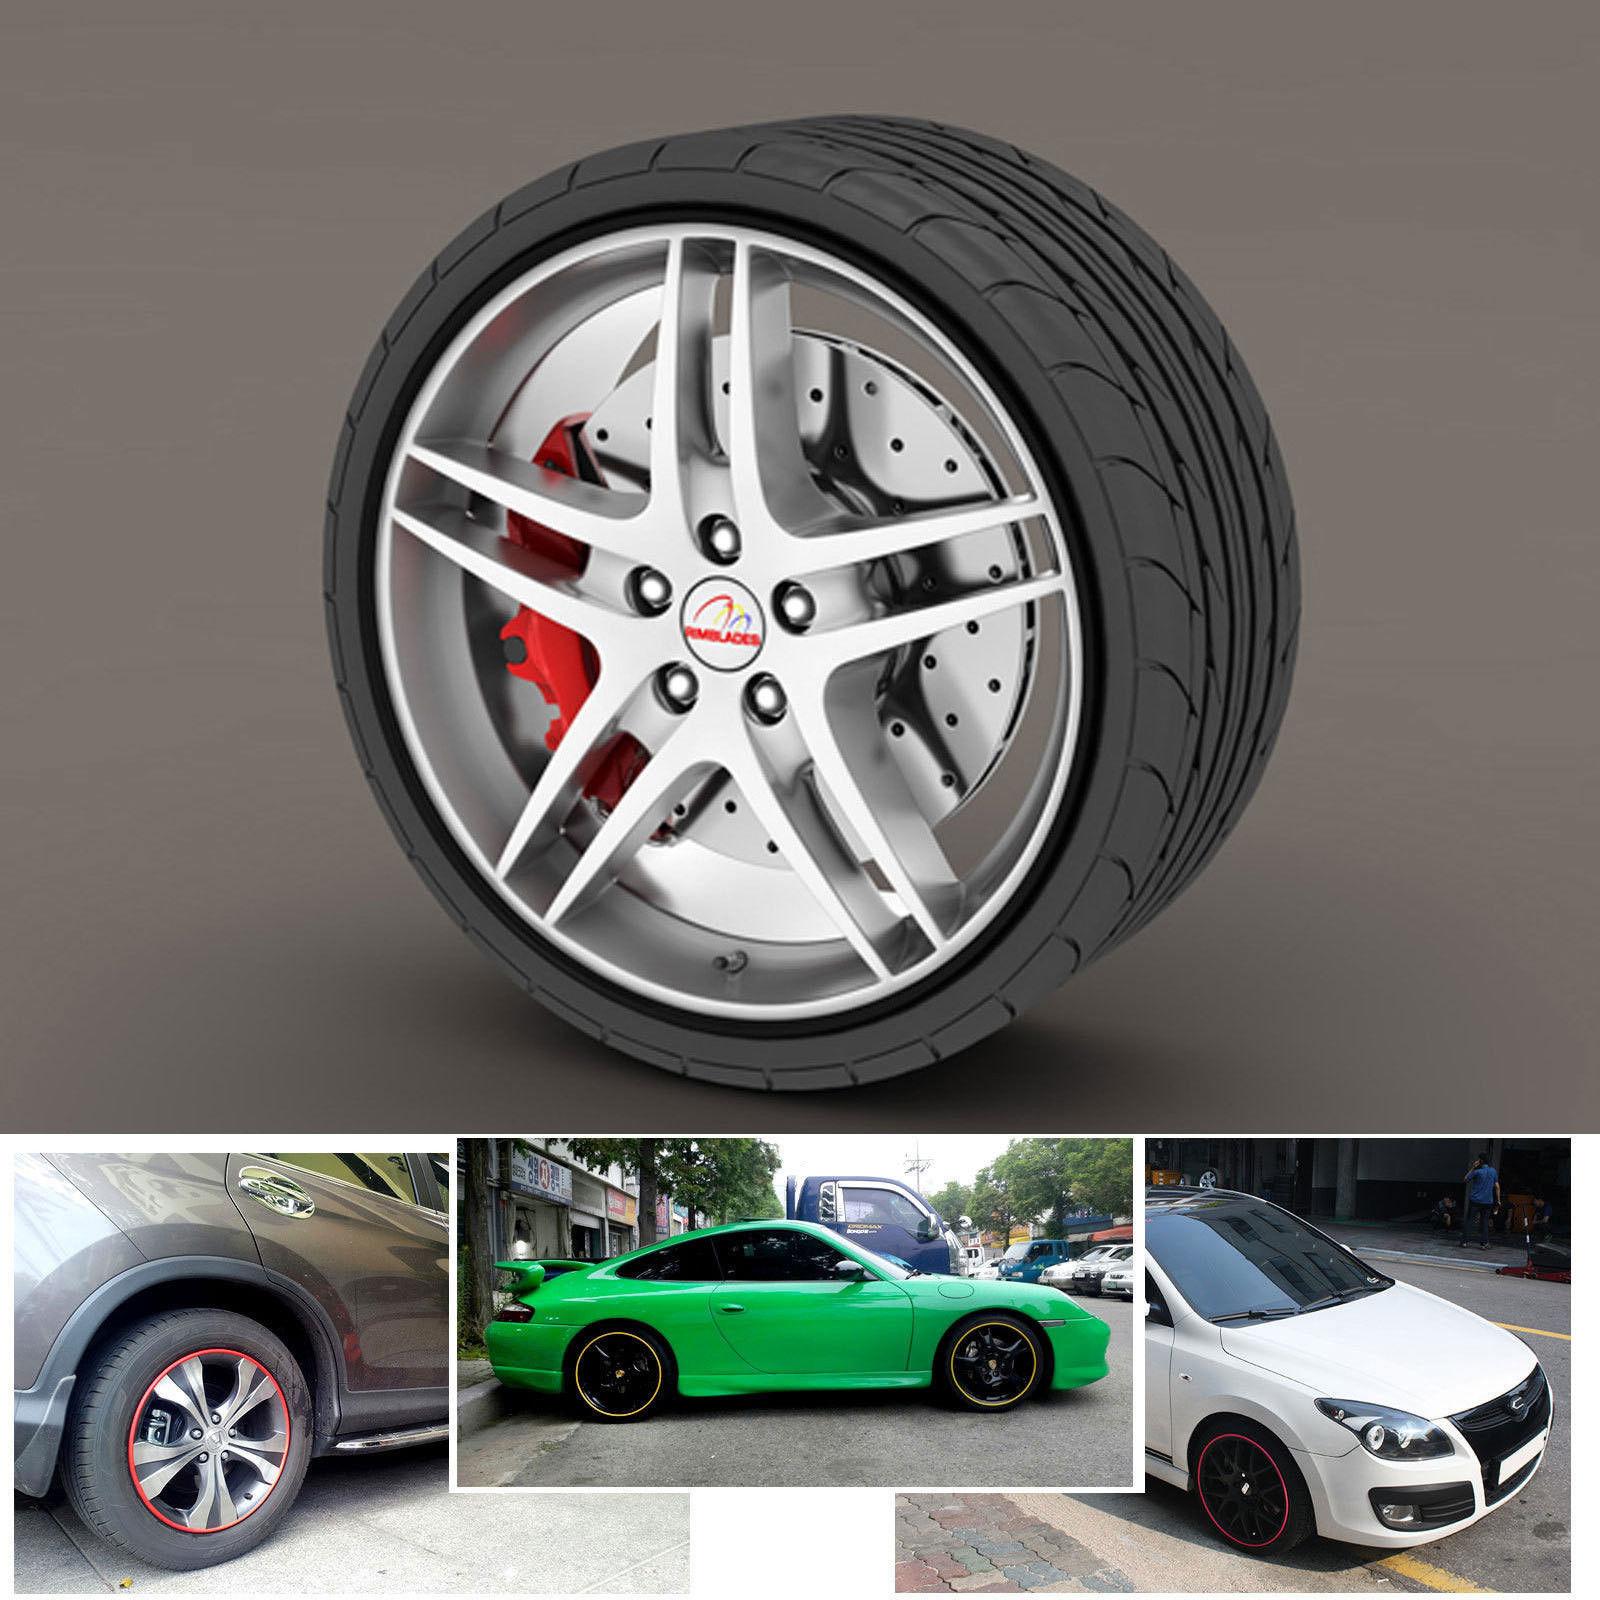 Jual Wheel Protector Pelindung Velg Warna Putih List Universal